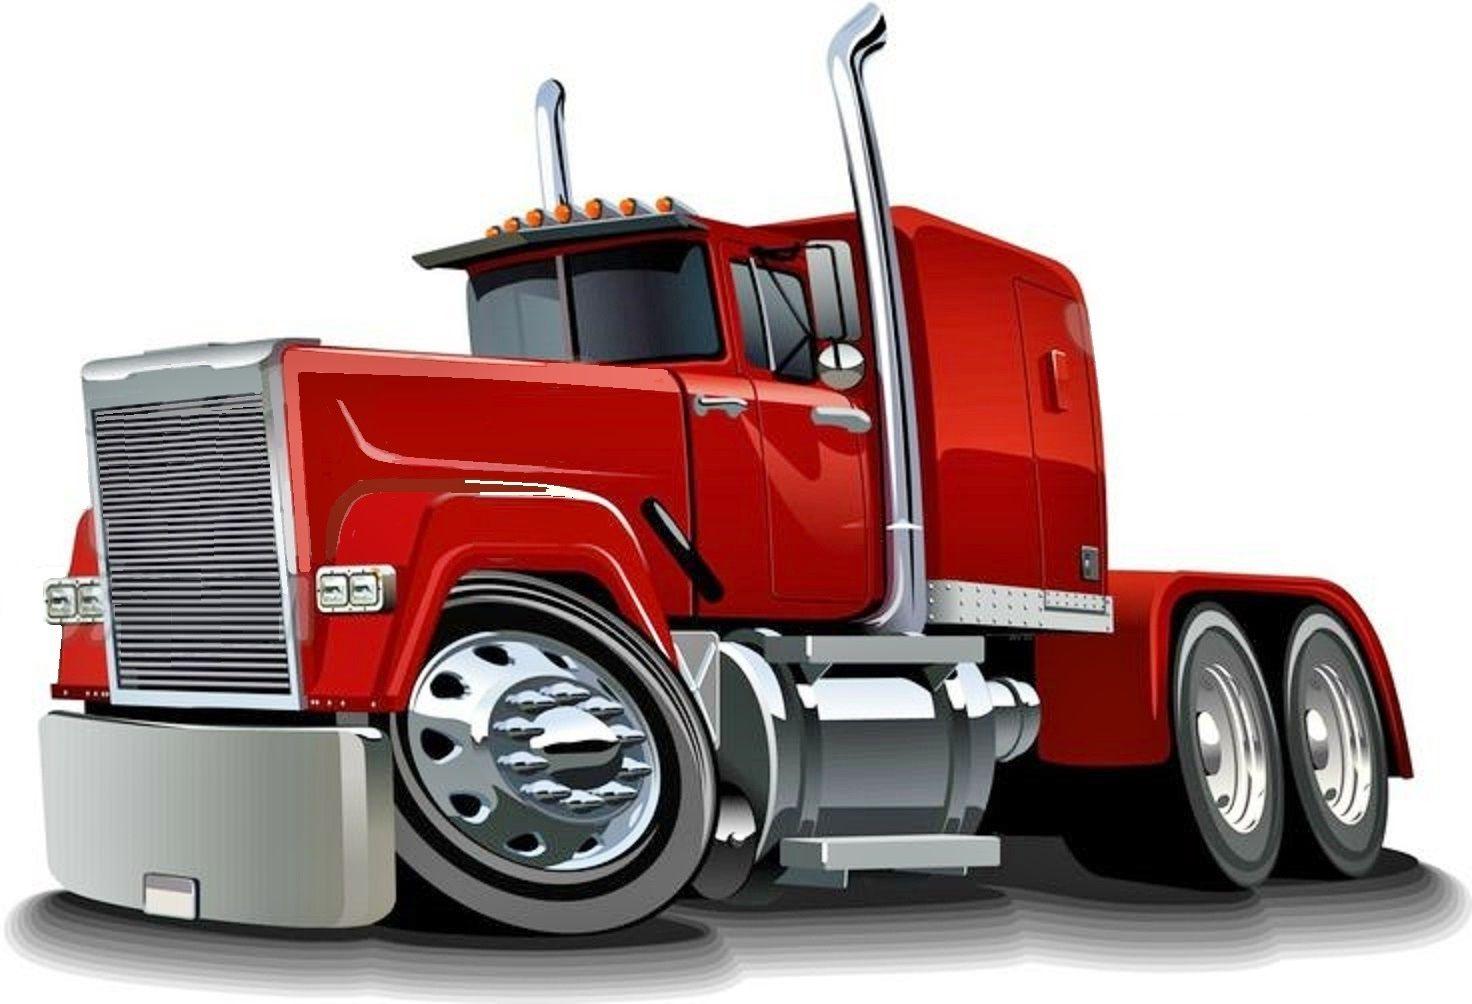 Pin by Michael Luzzi on WONDERFUL ILLUSTRATIONS Truck